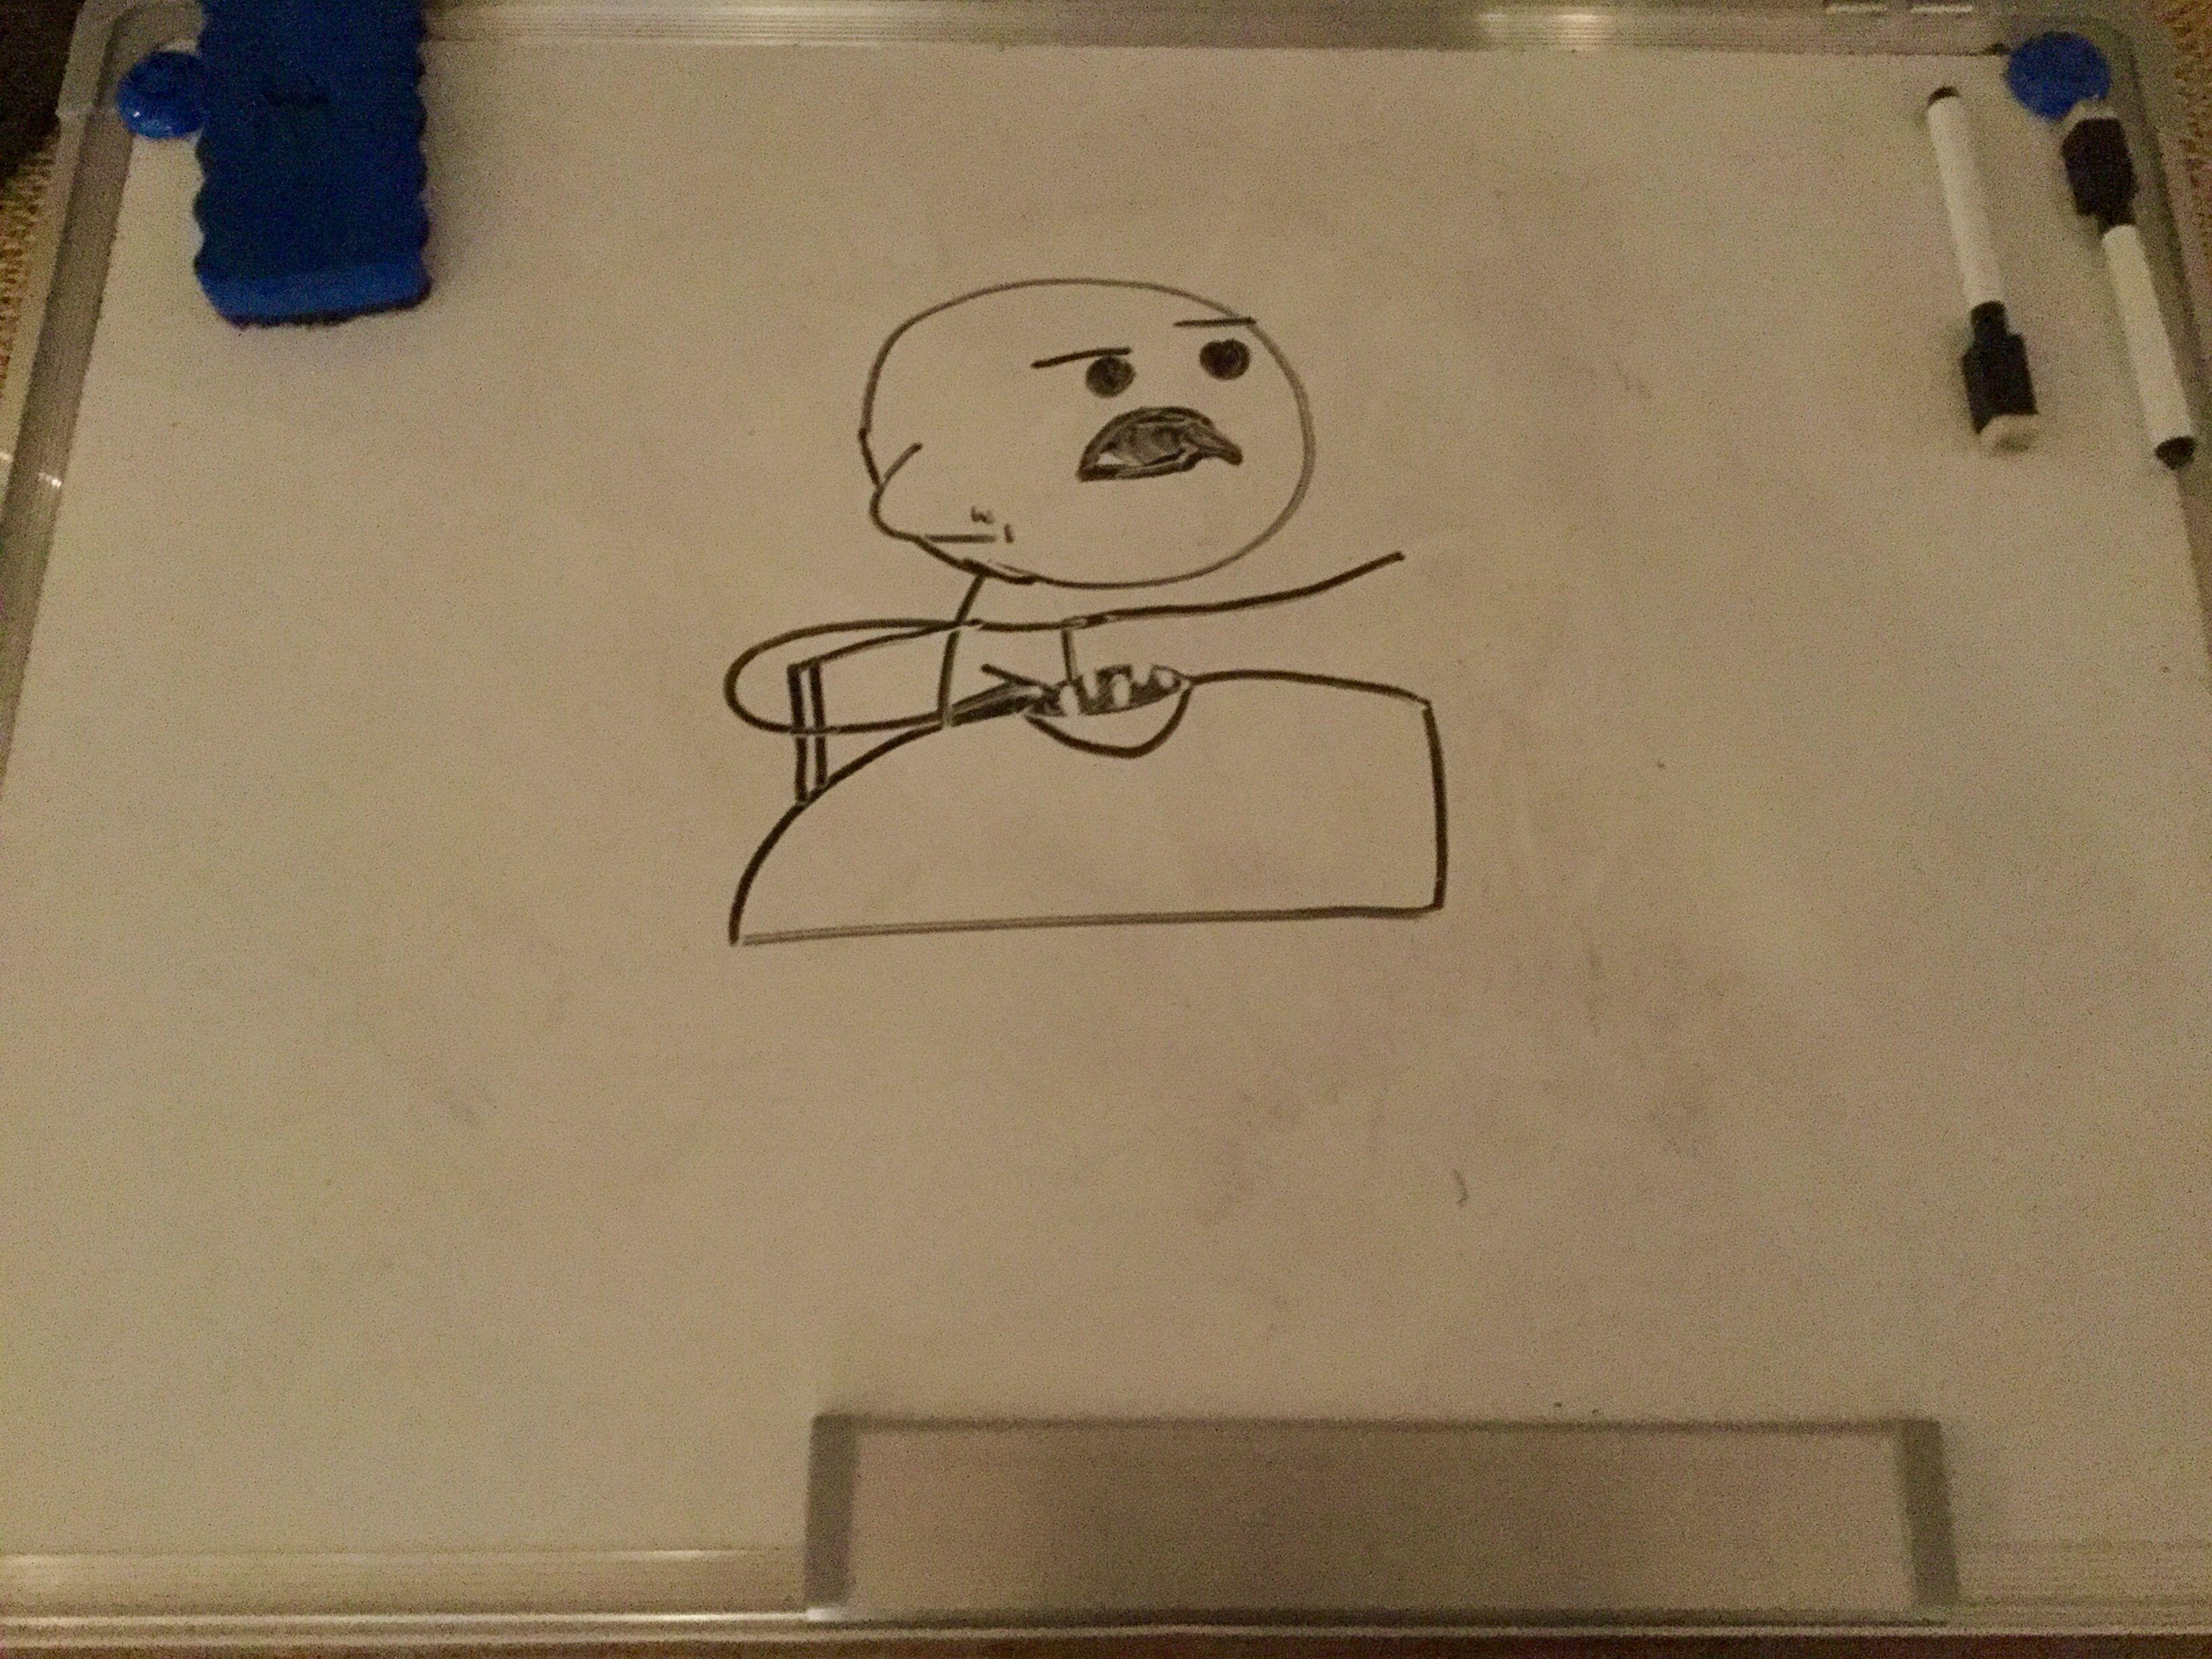 Whiteboard Meme Drawings Art Fictional Characters